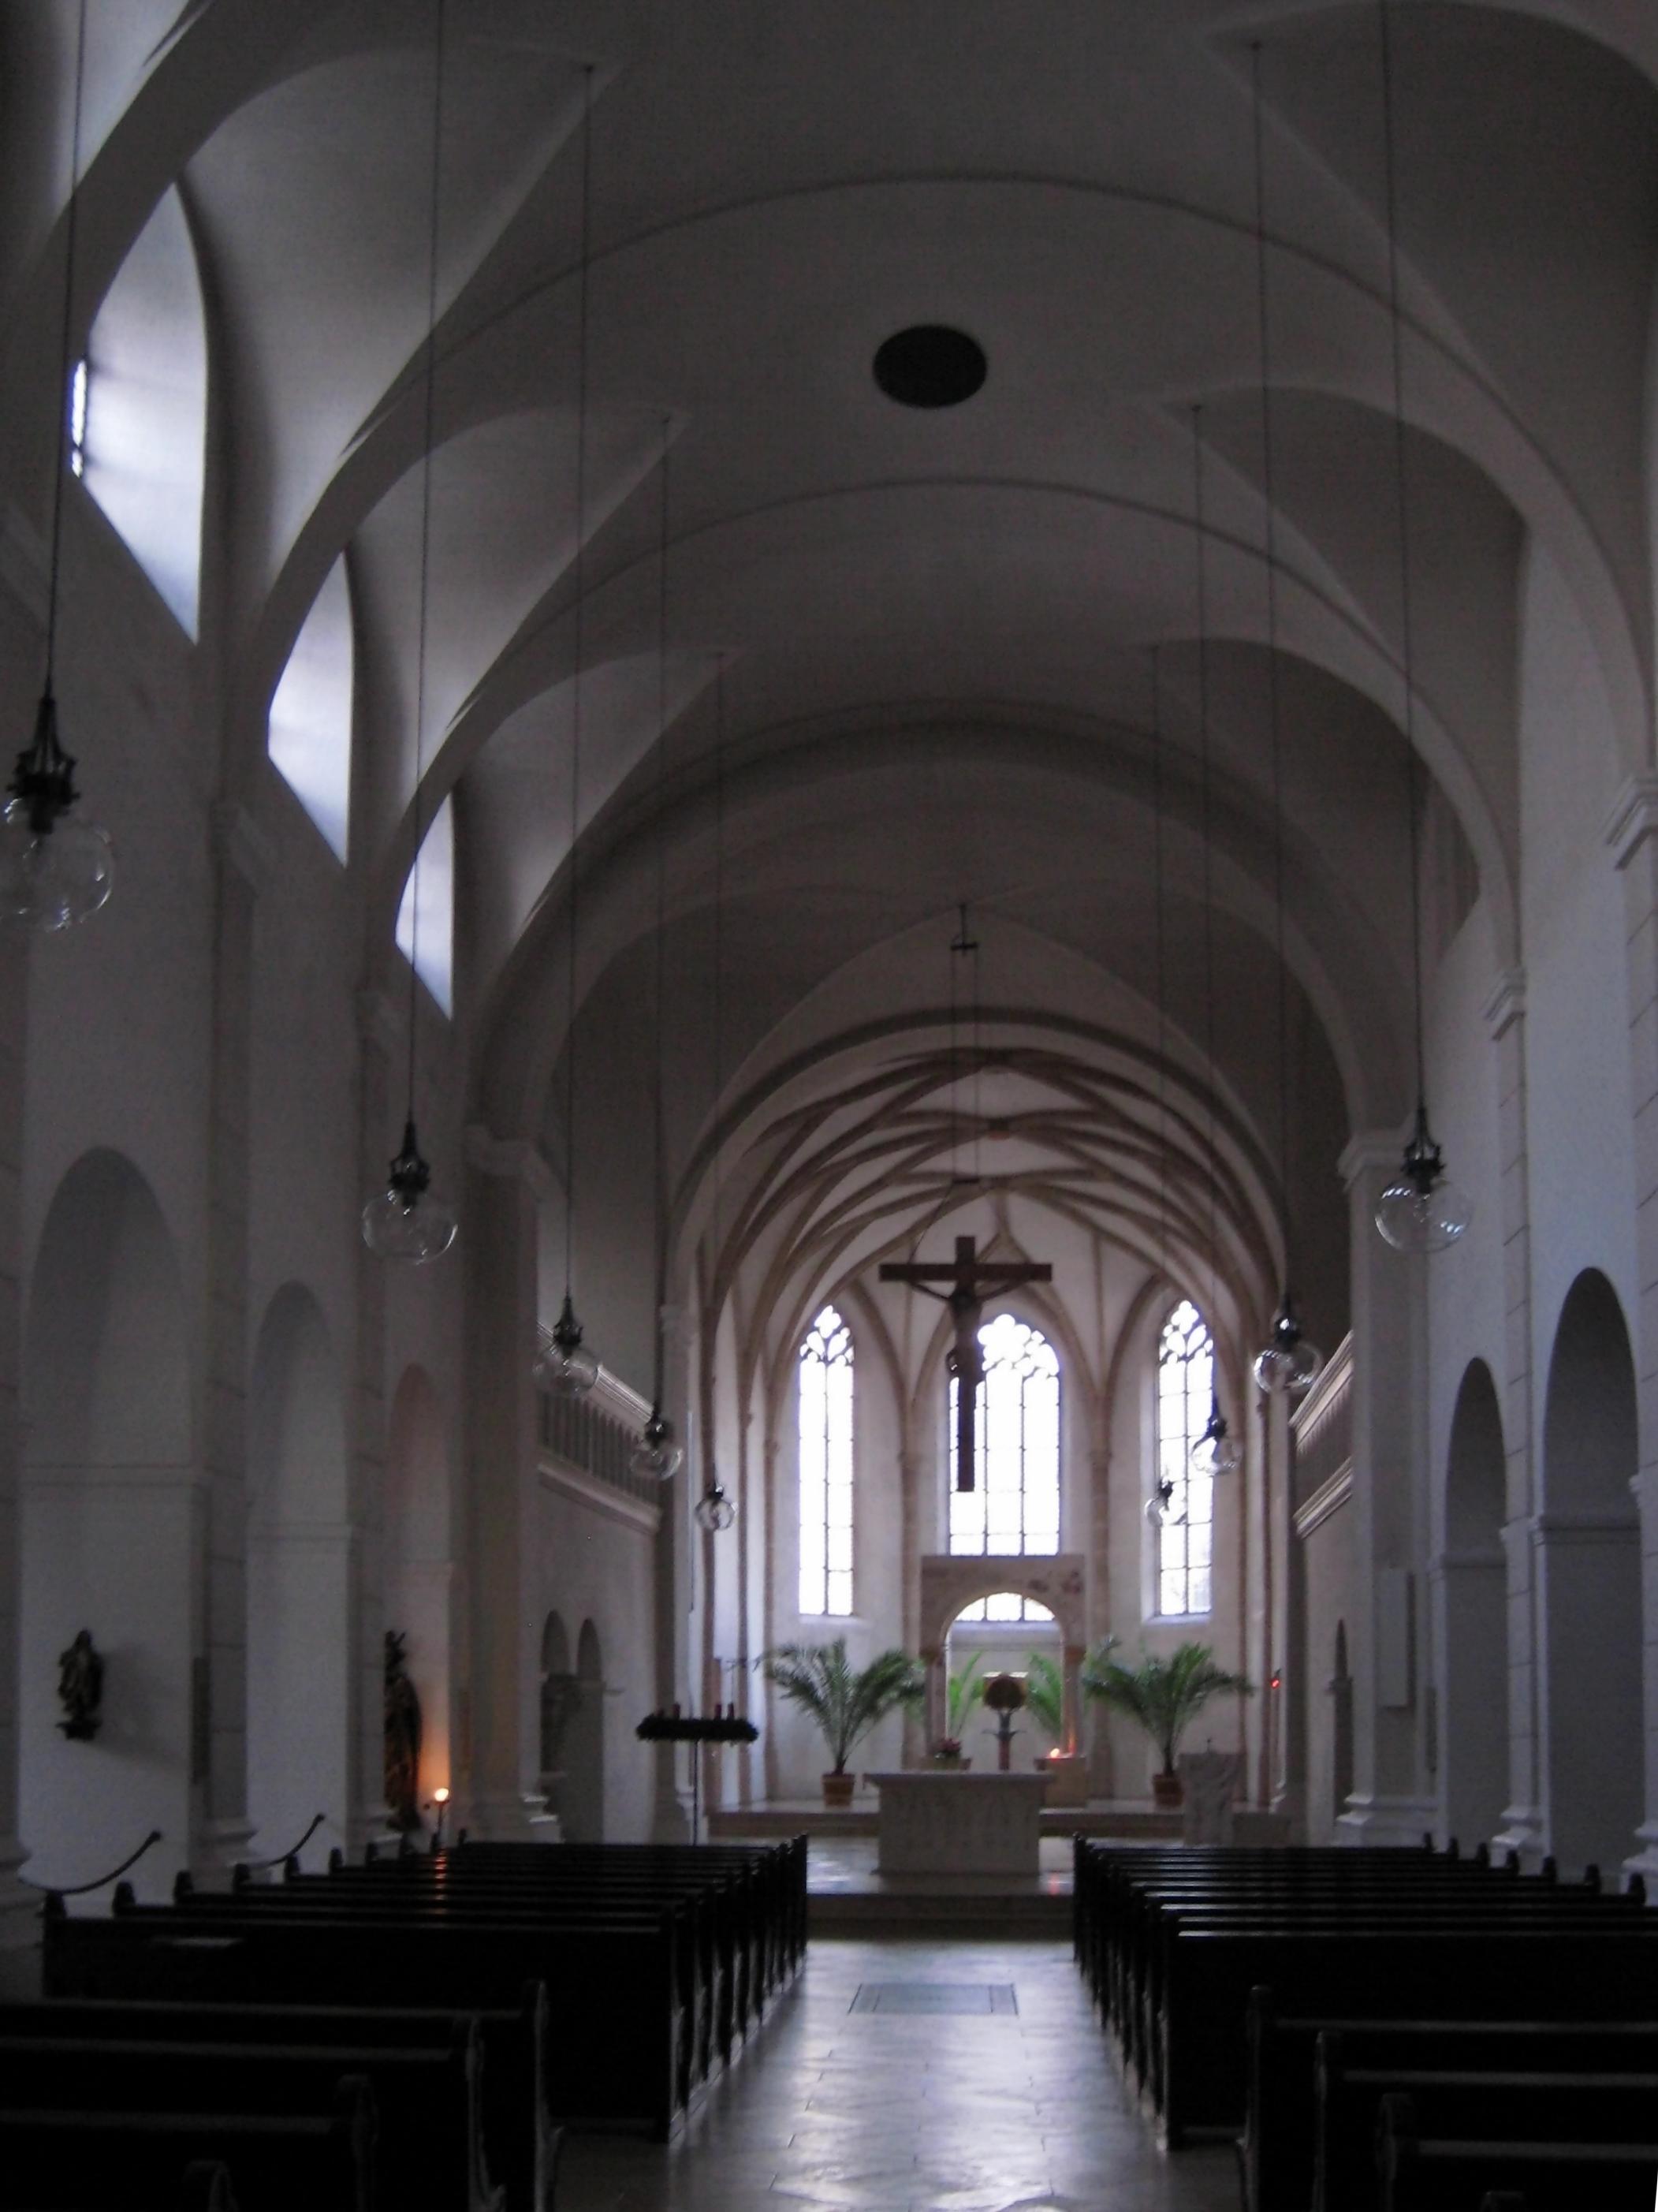 http://upload.wikimedia.org/wikipedia/commons/8/86/Kloster_Niedernburg_Passau_Innenraum.jpg